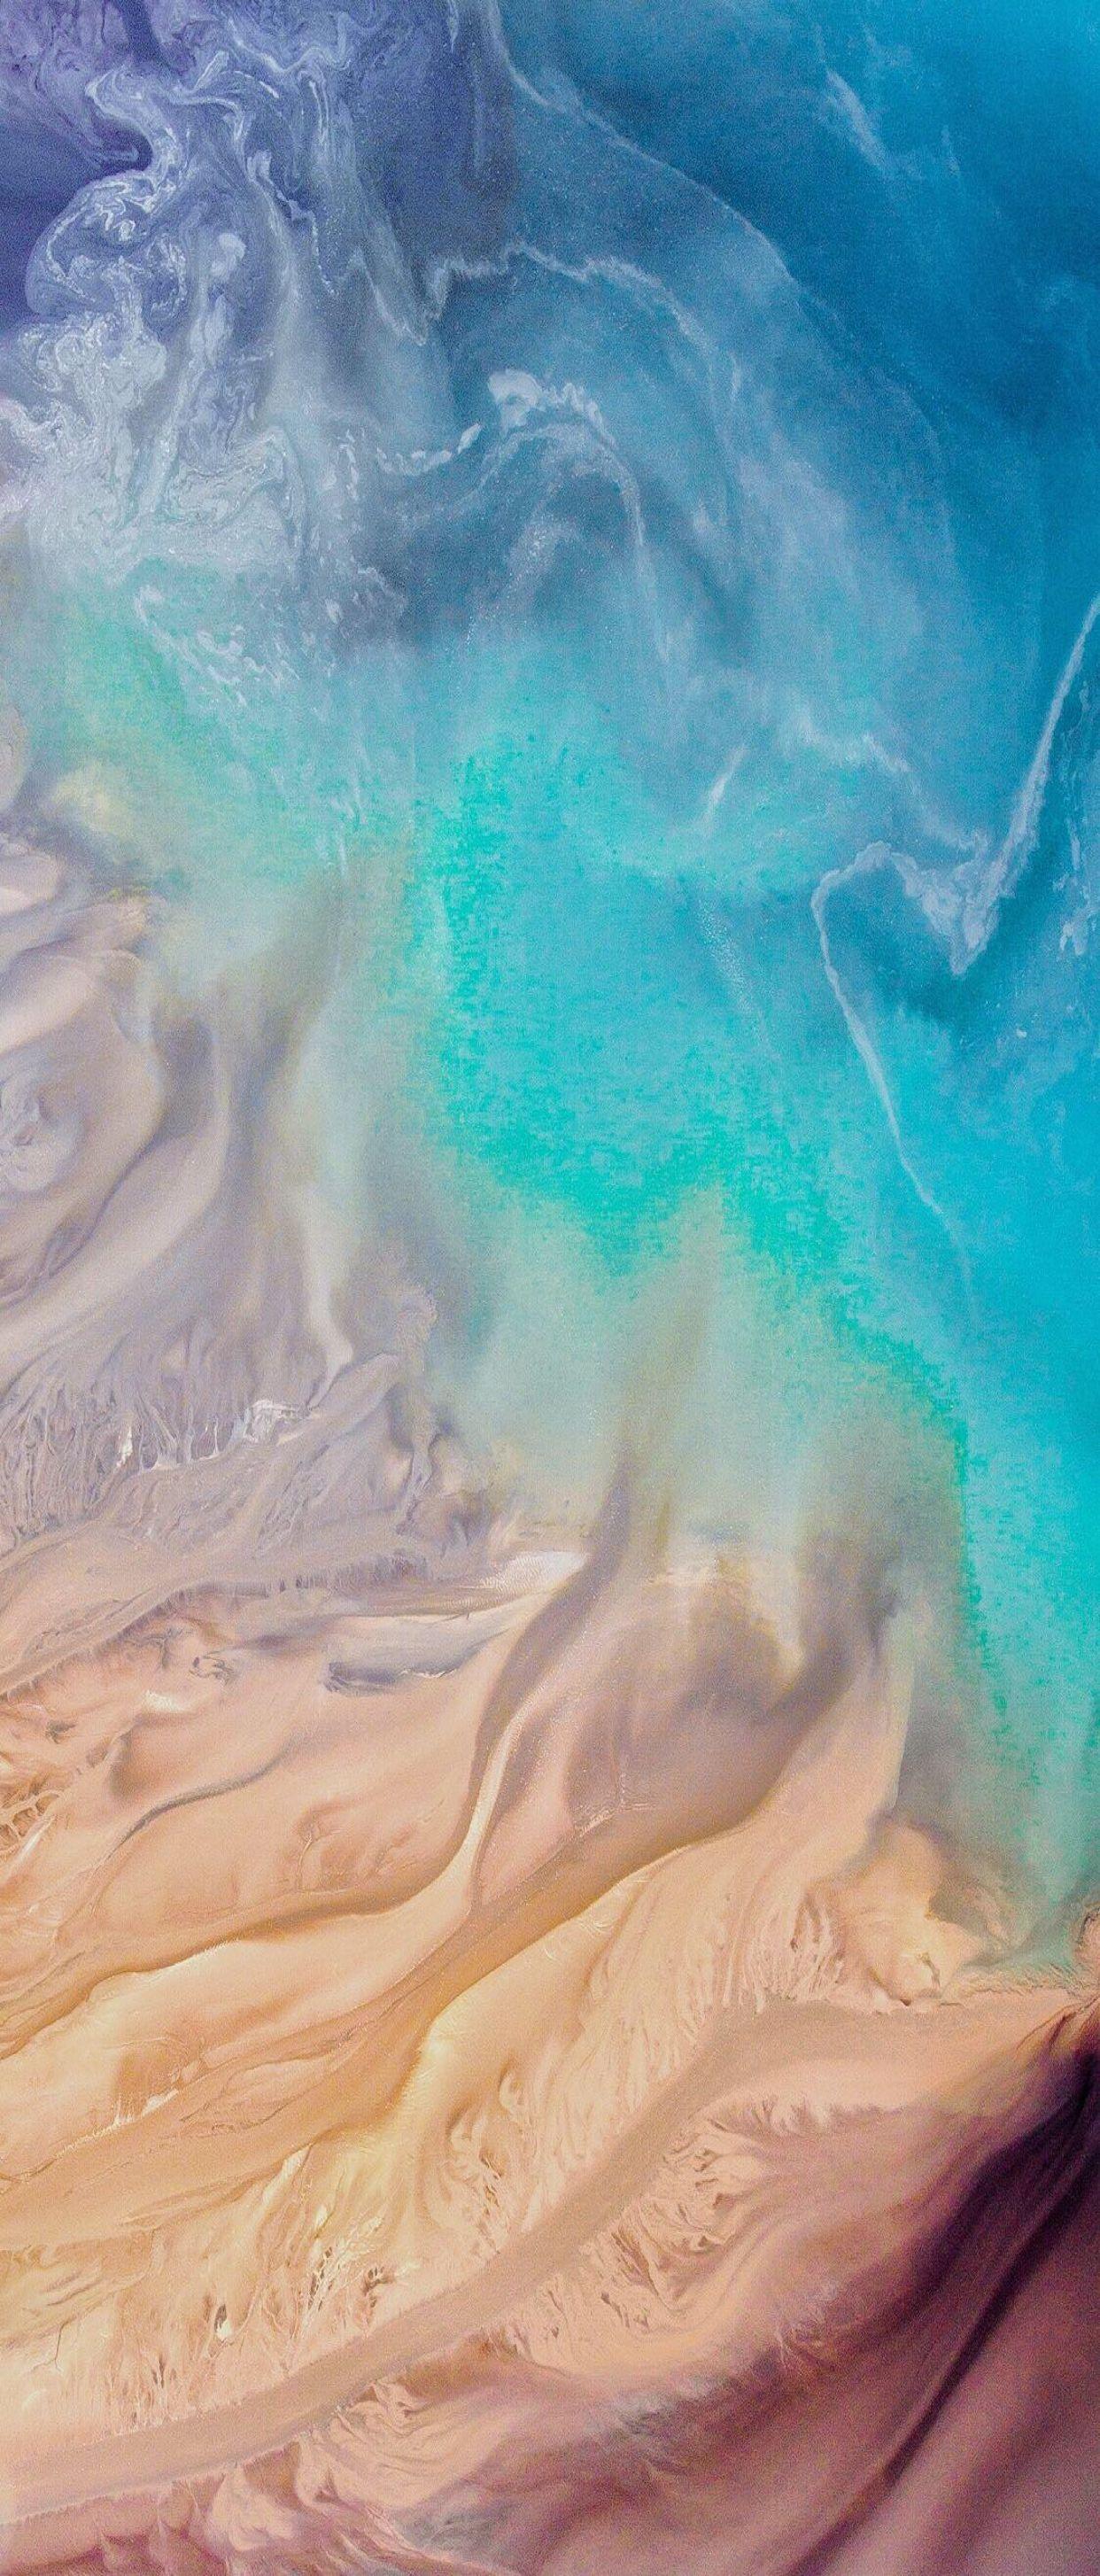 Ios 11 Iphone X Aqua Blue Water Beach Wave Ocean Apple Wallpaper Iphone 8 Clean Beauty Ios 11 Wallpaper Apple Wallpaper Iphone Samsung Wallpaper